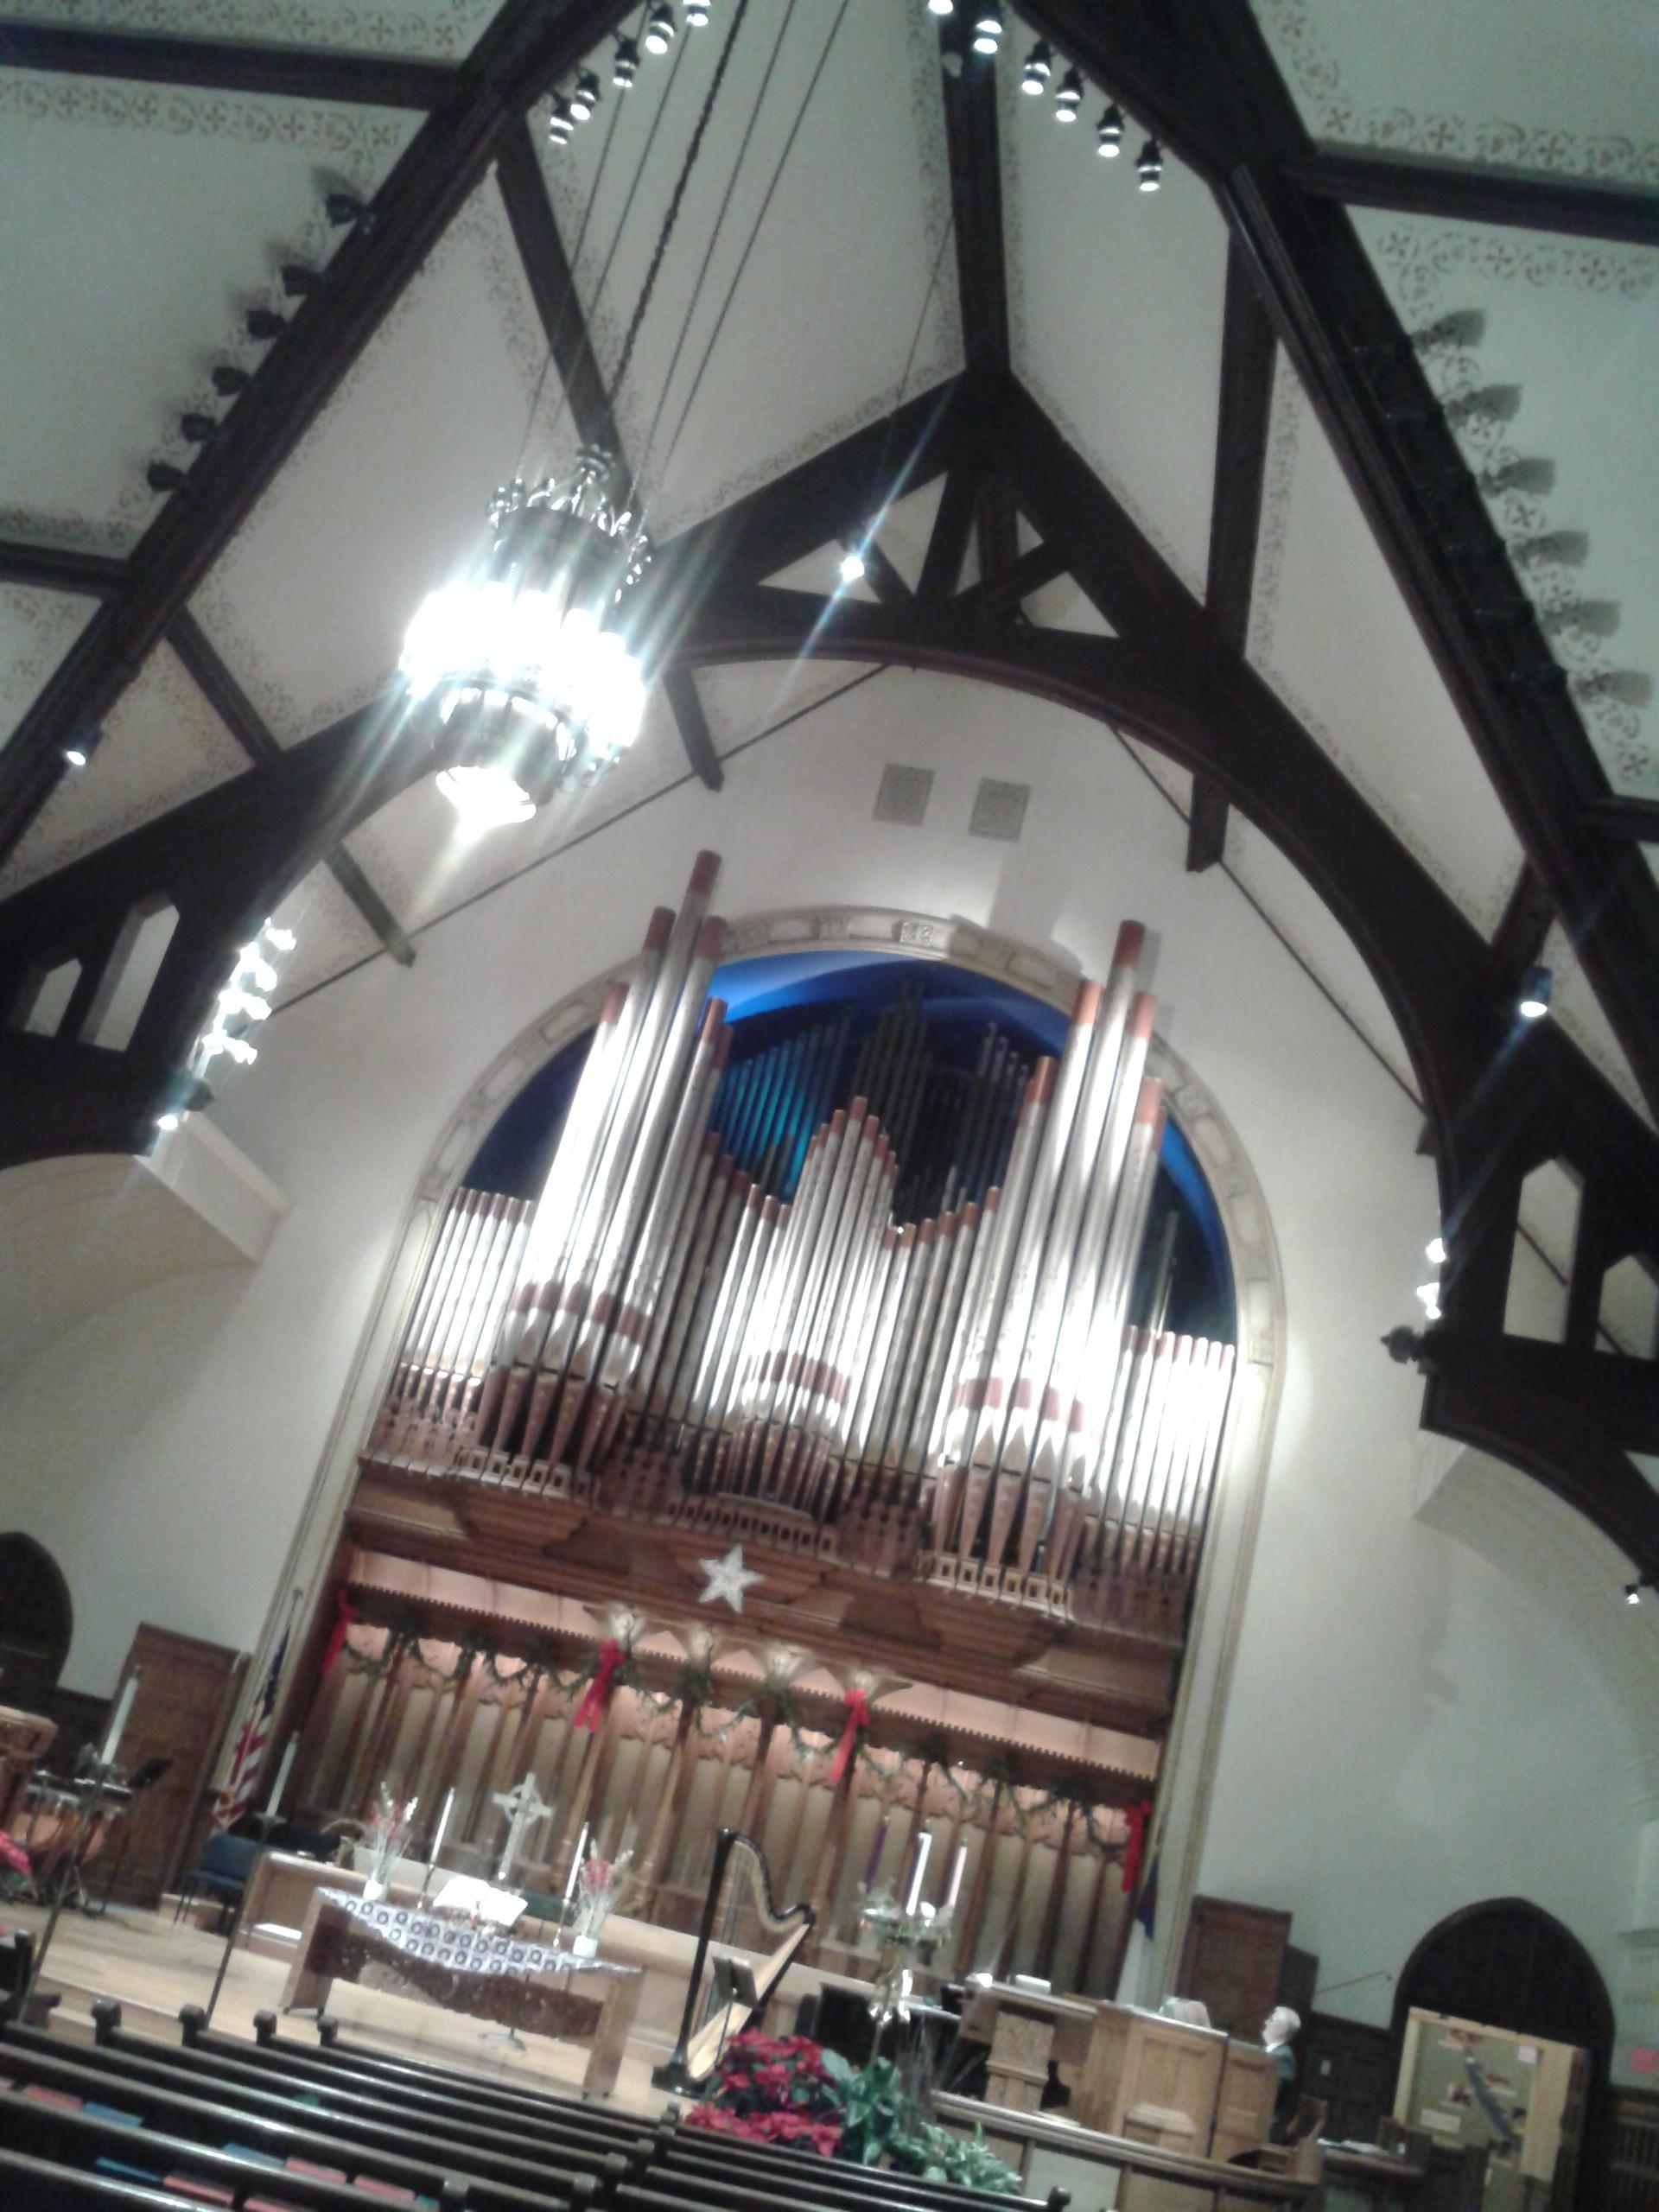 First Presbyterian of Evanston